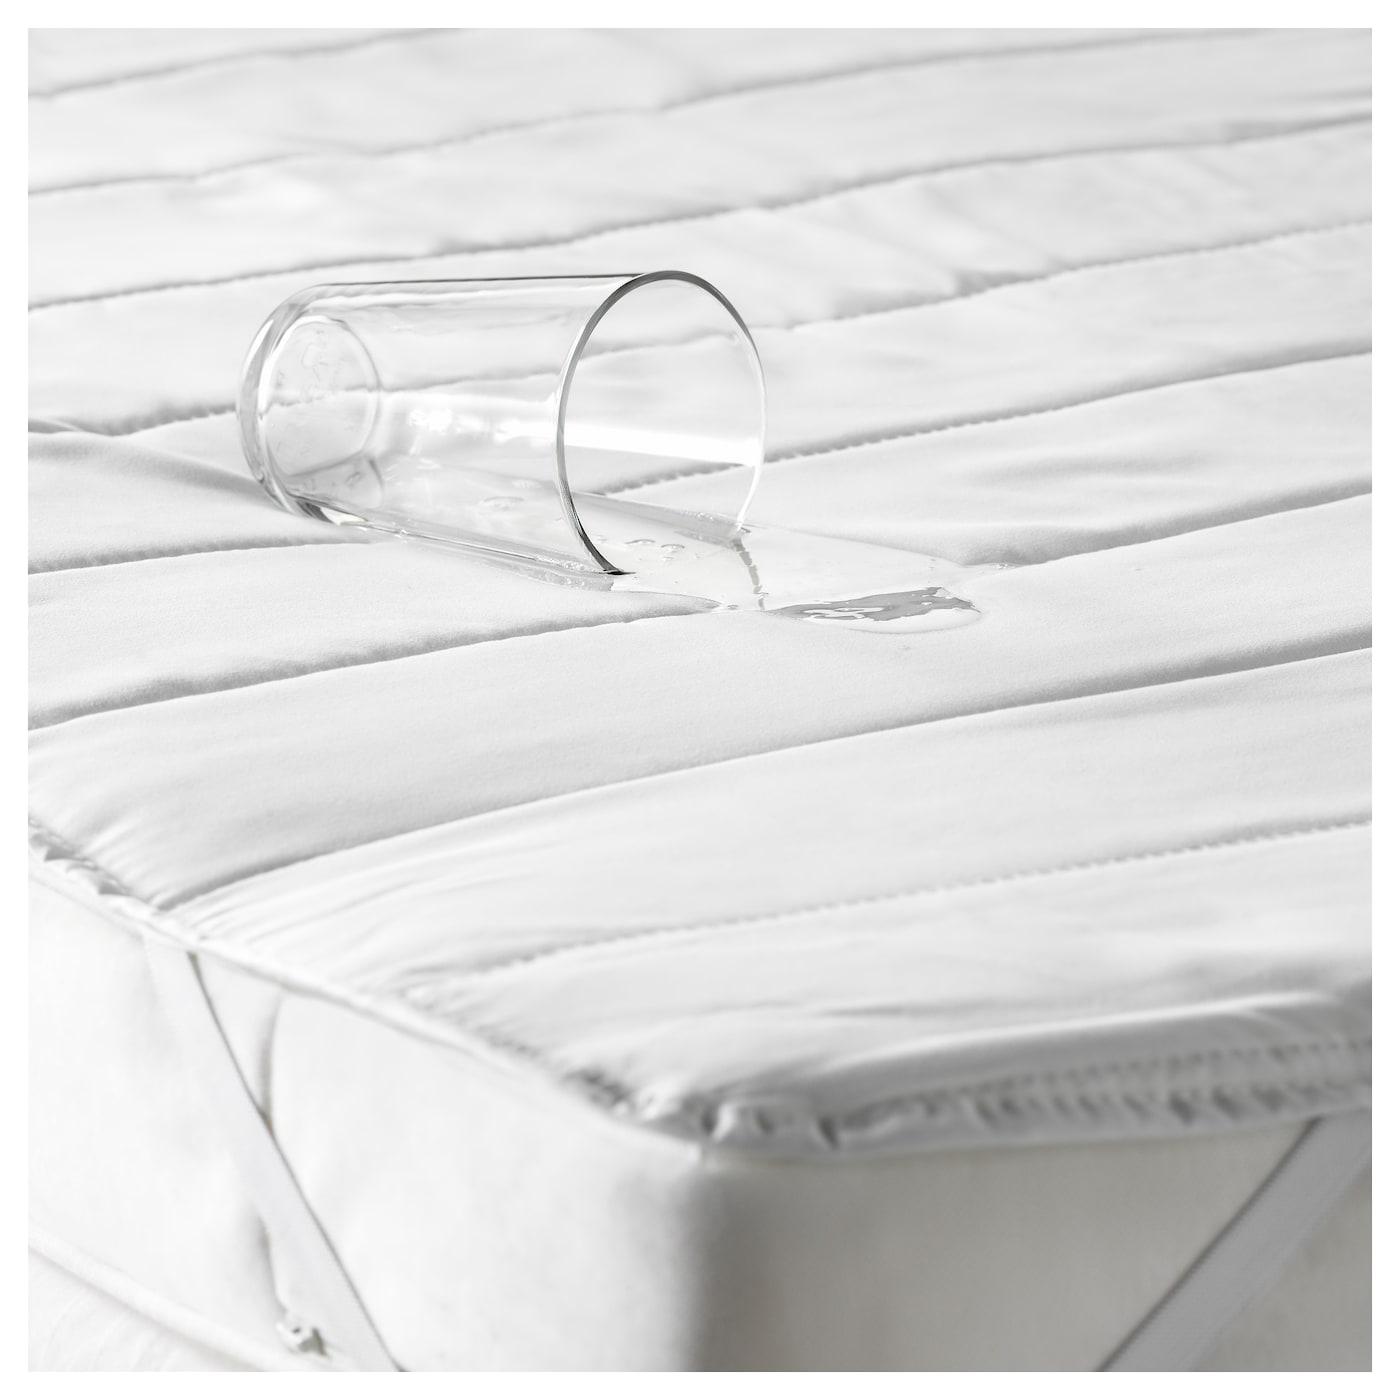 ikea nattlig waterproof mattress protector the waterproof inner layer protects the mattress